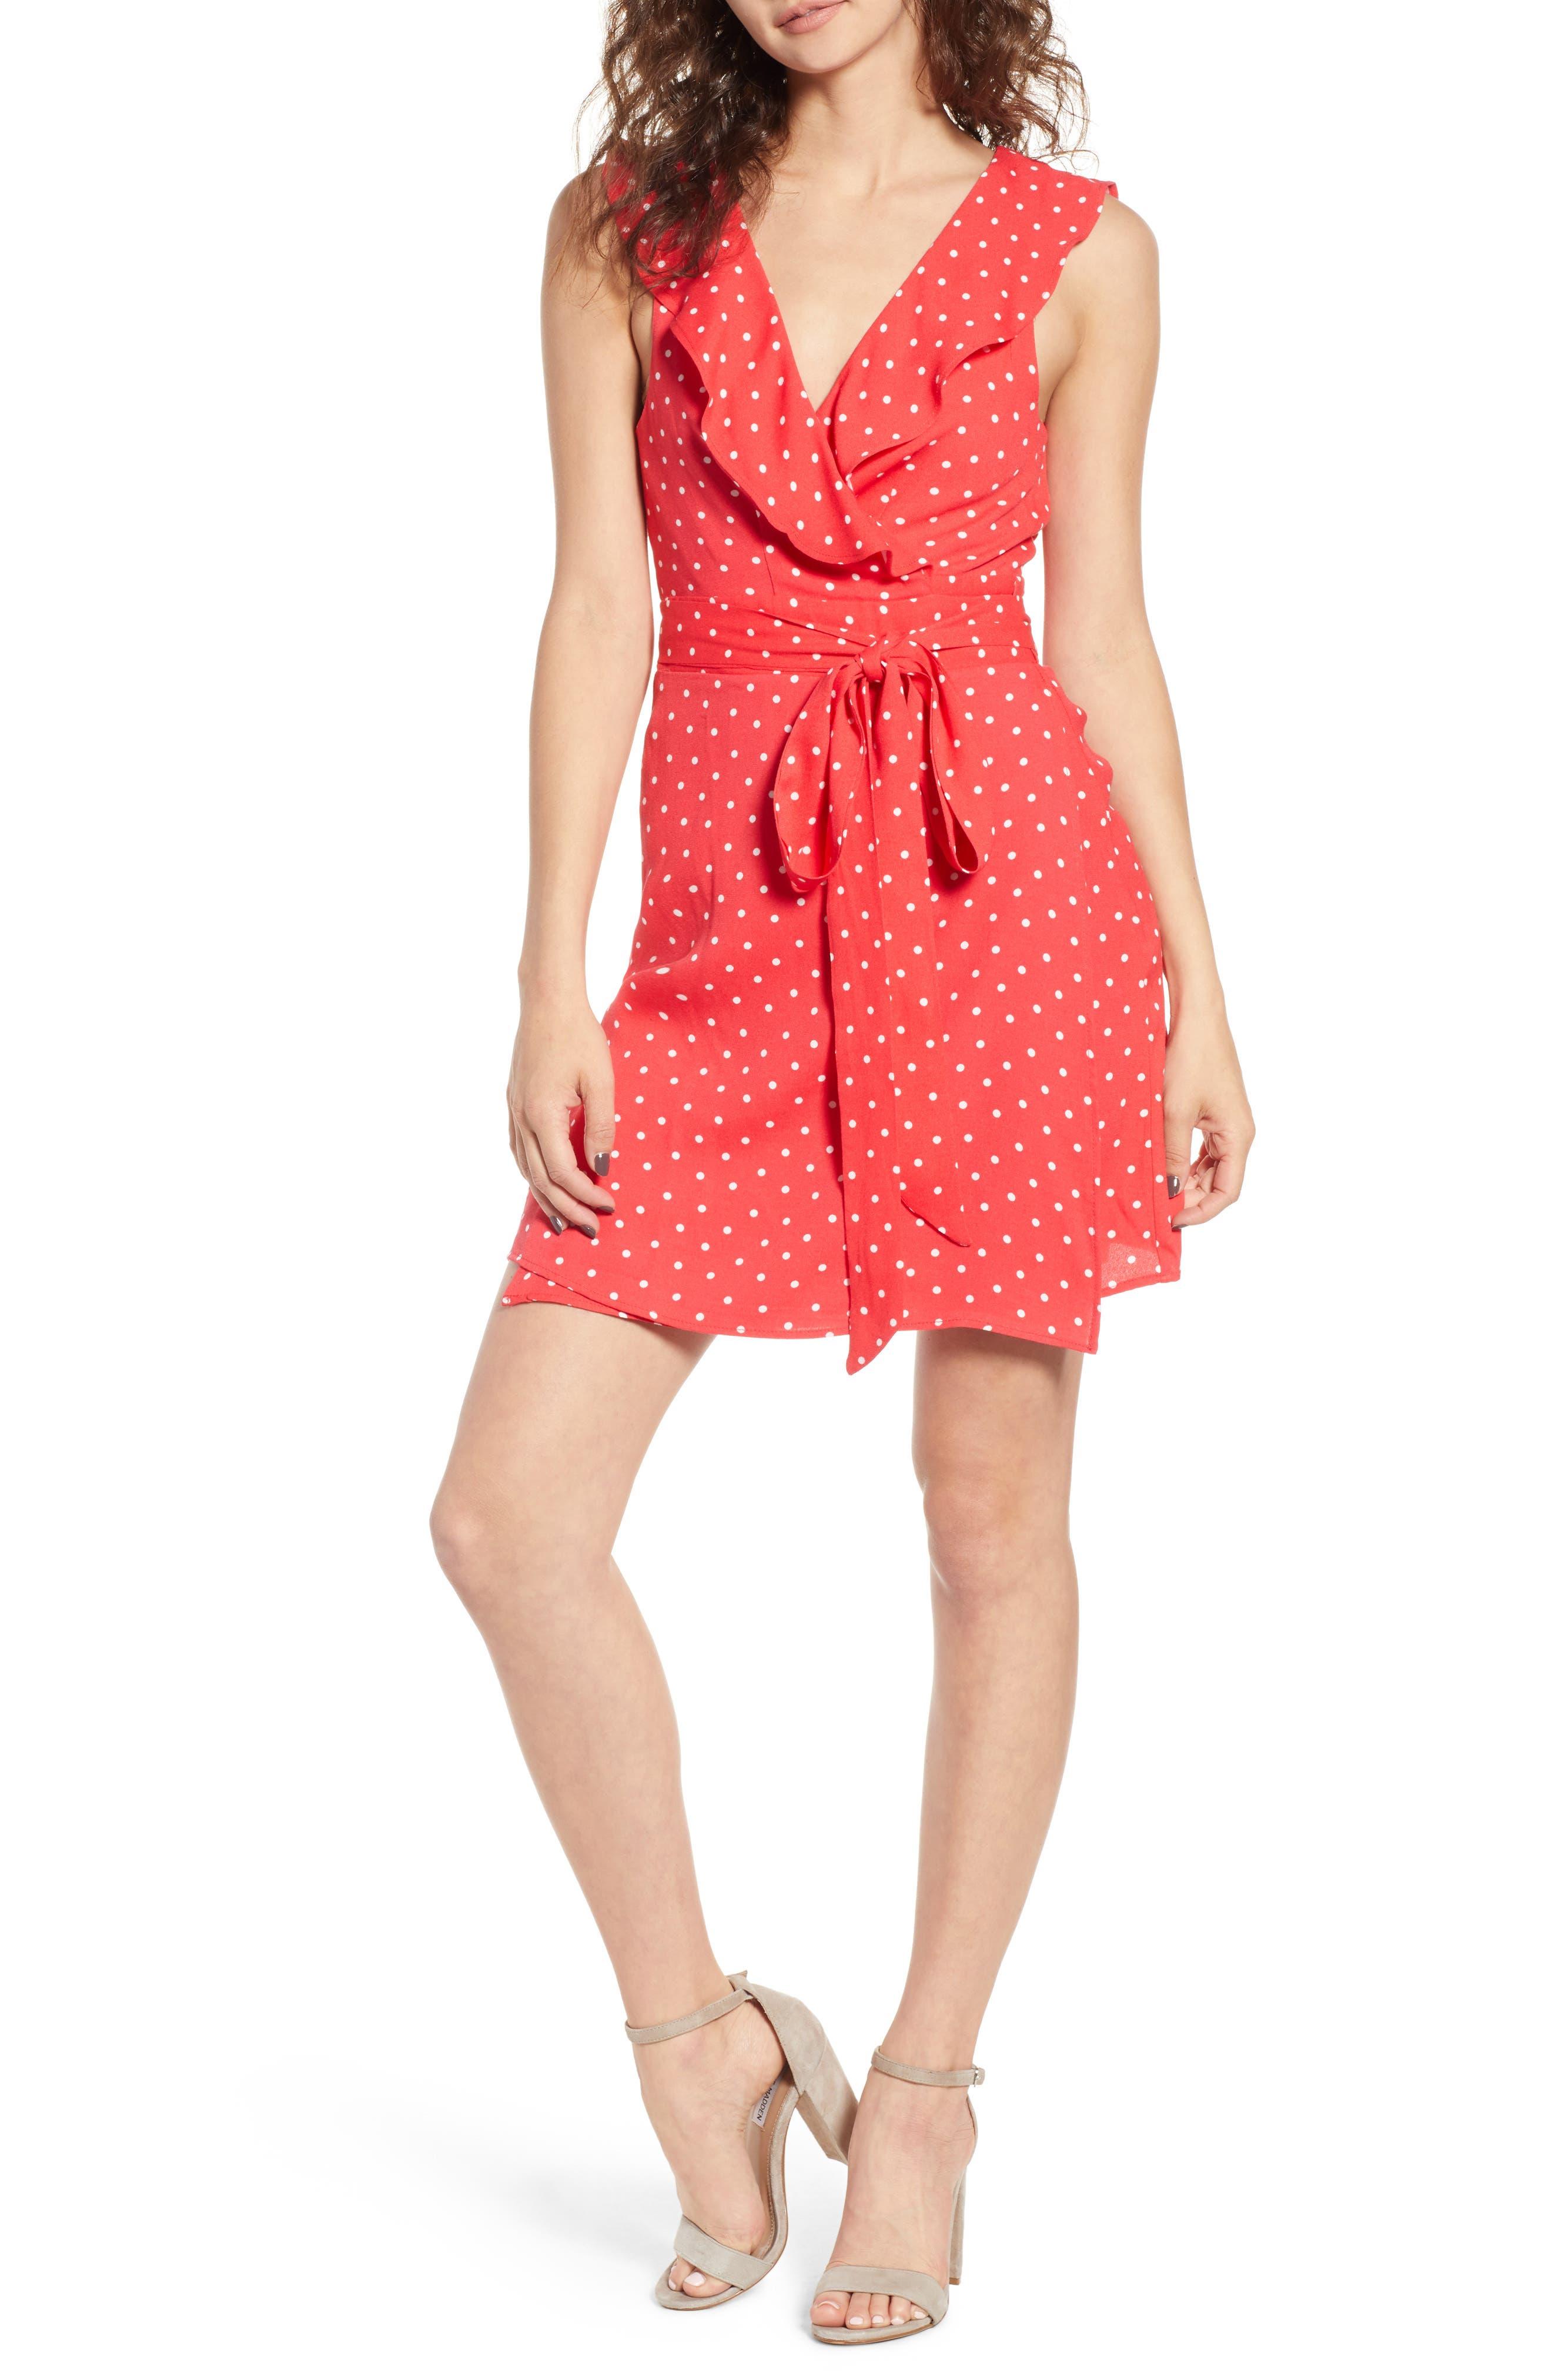 Jess Wrap Dress,                         Main,                         color, Red Polka Dot